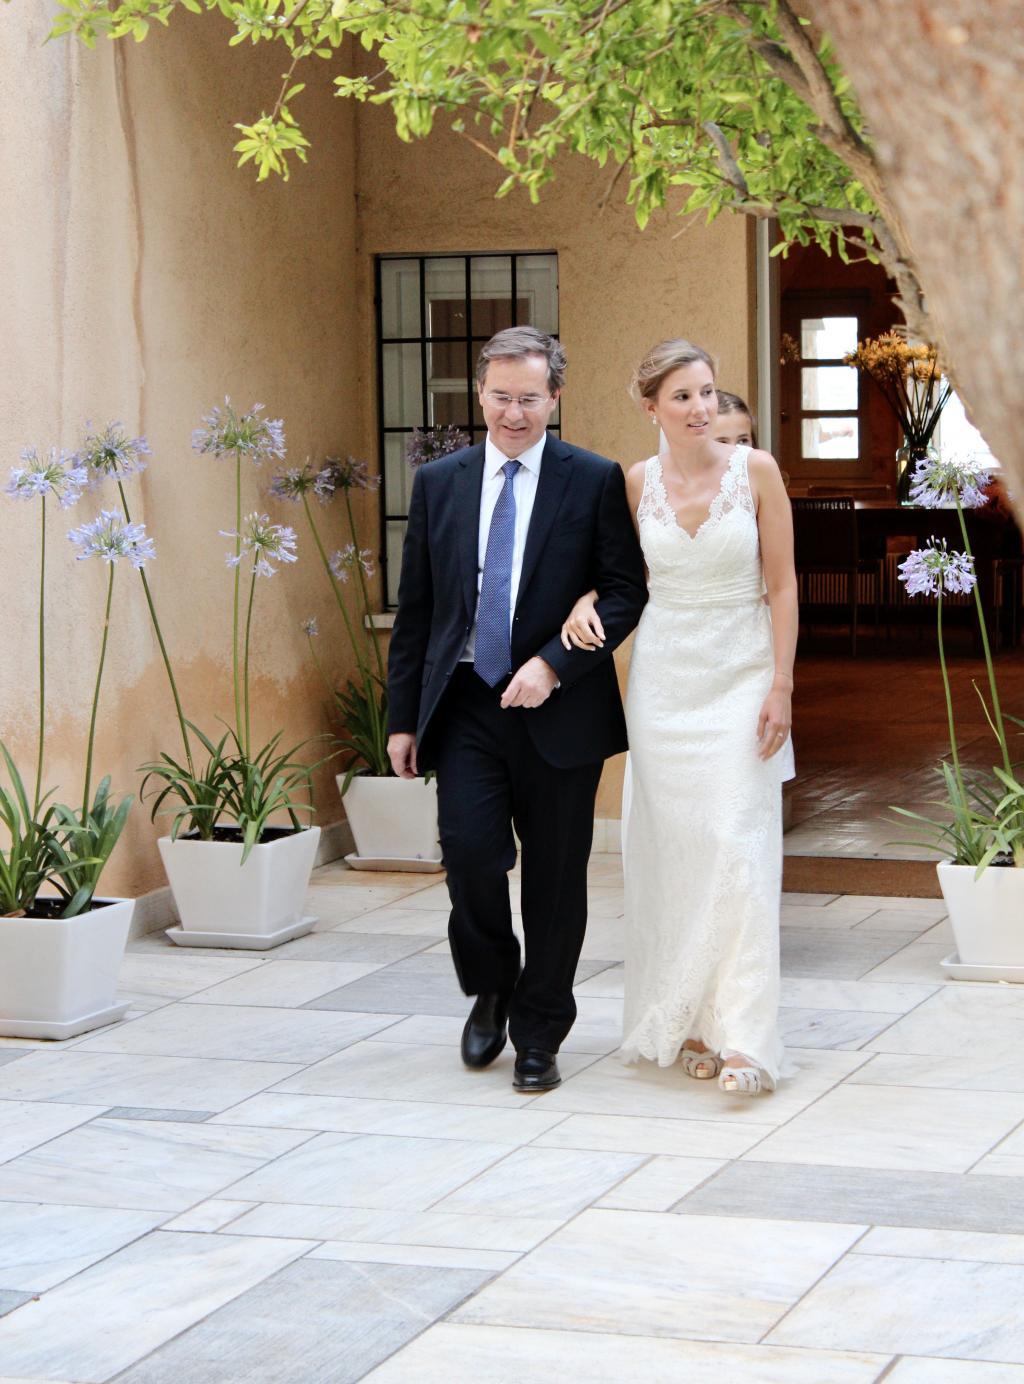 D&G Sounio wedding - Image 15